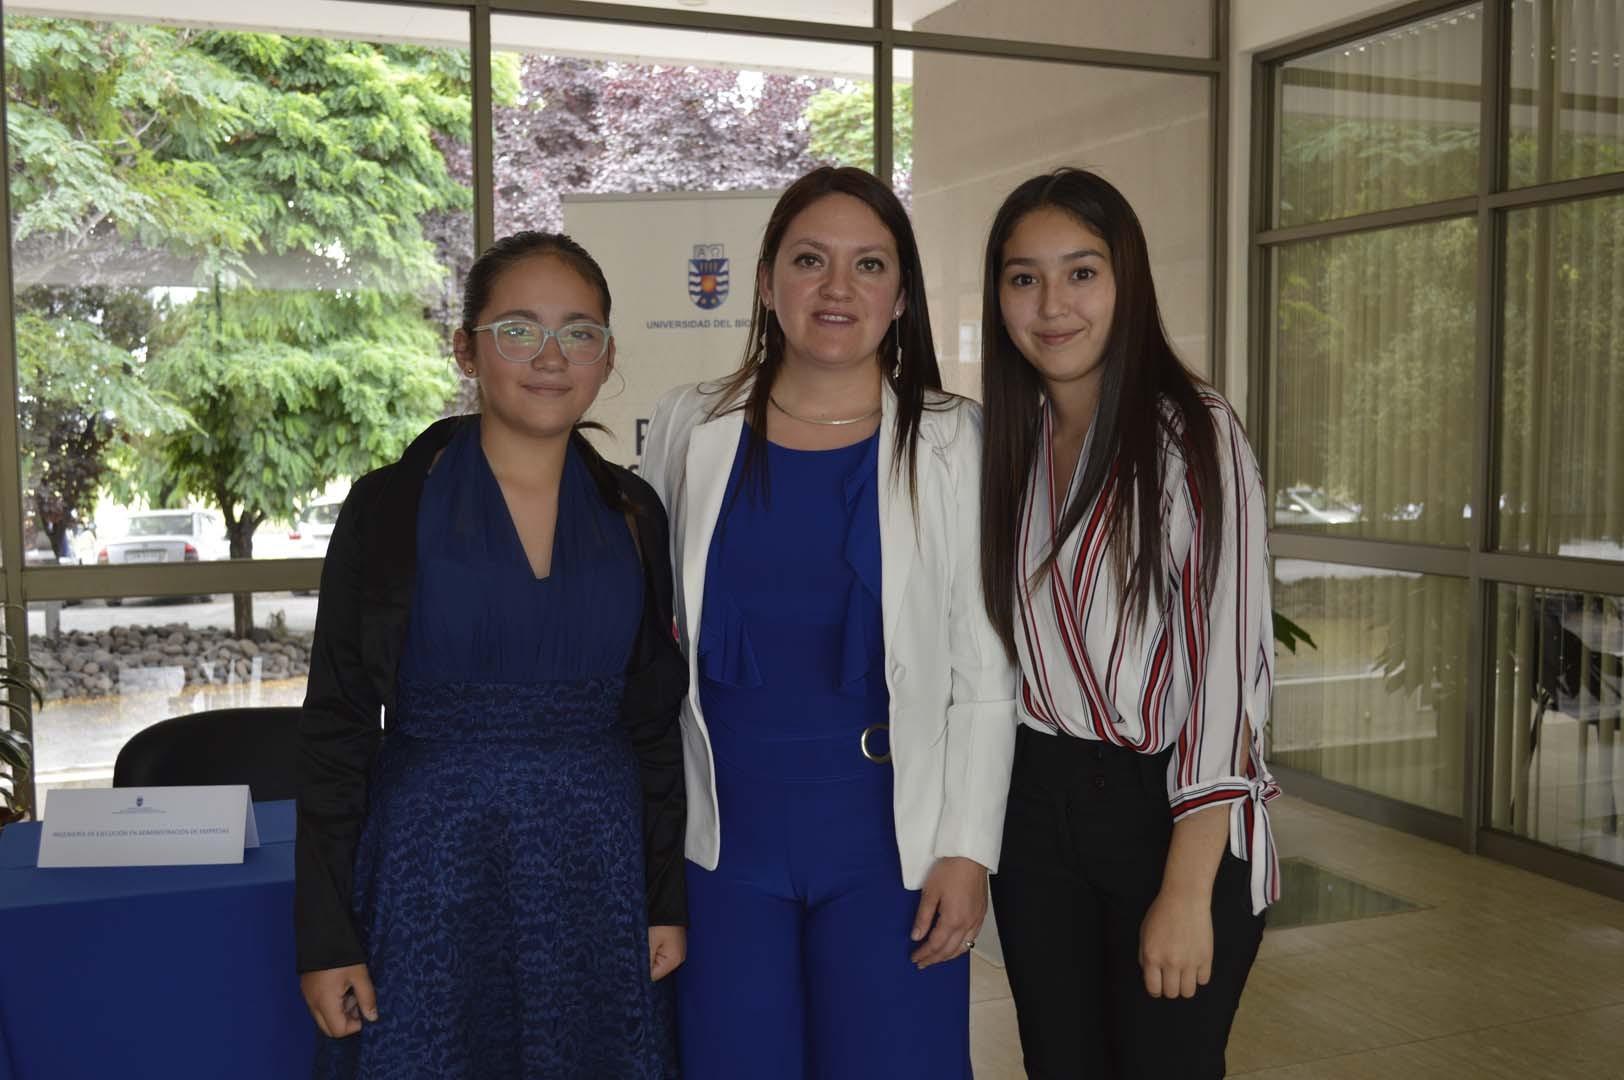 Martina Venegas, Daniela Riquelme y Madeleine Mardones